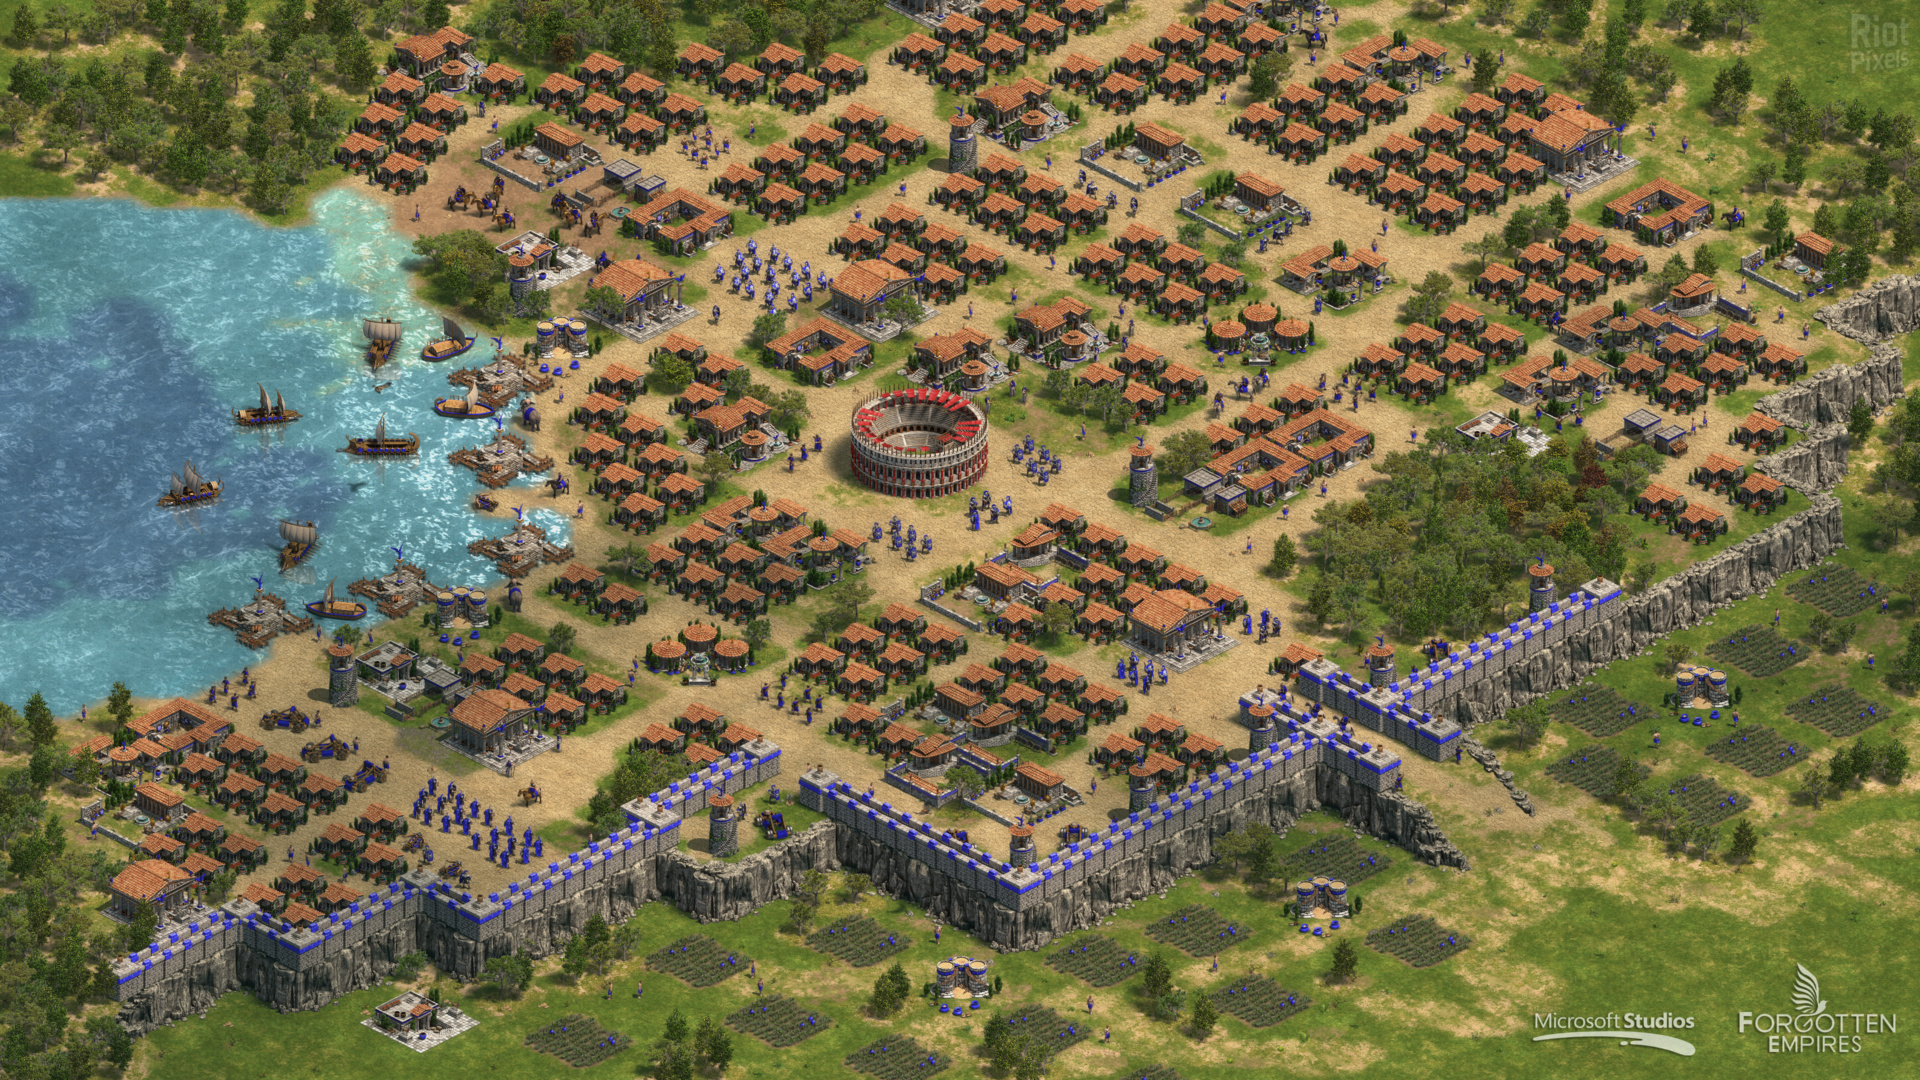 screenshot.age-of-empires-definitive-edition.1920x1080.2017-06-12.11.jpg